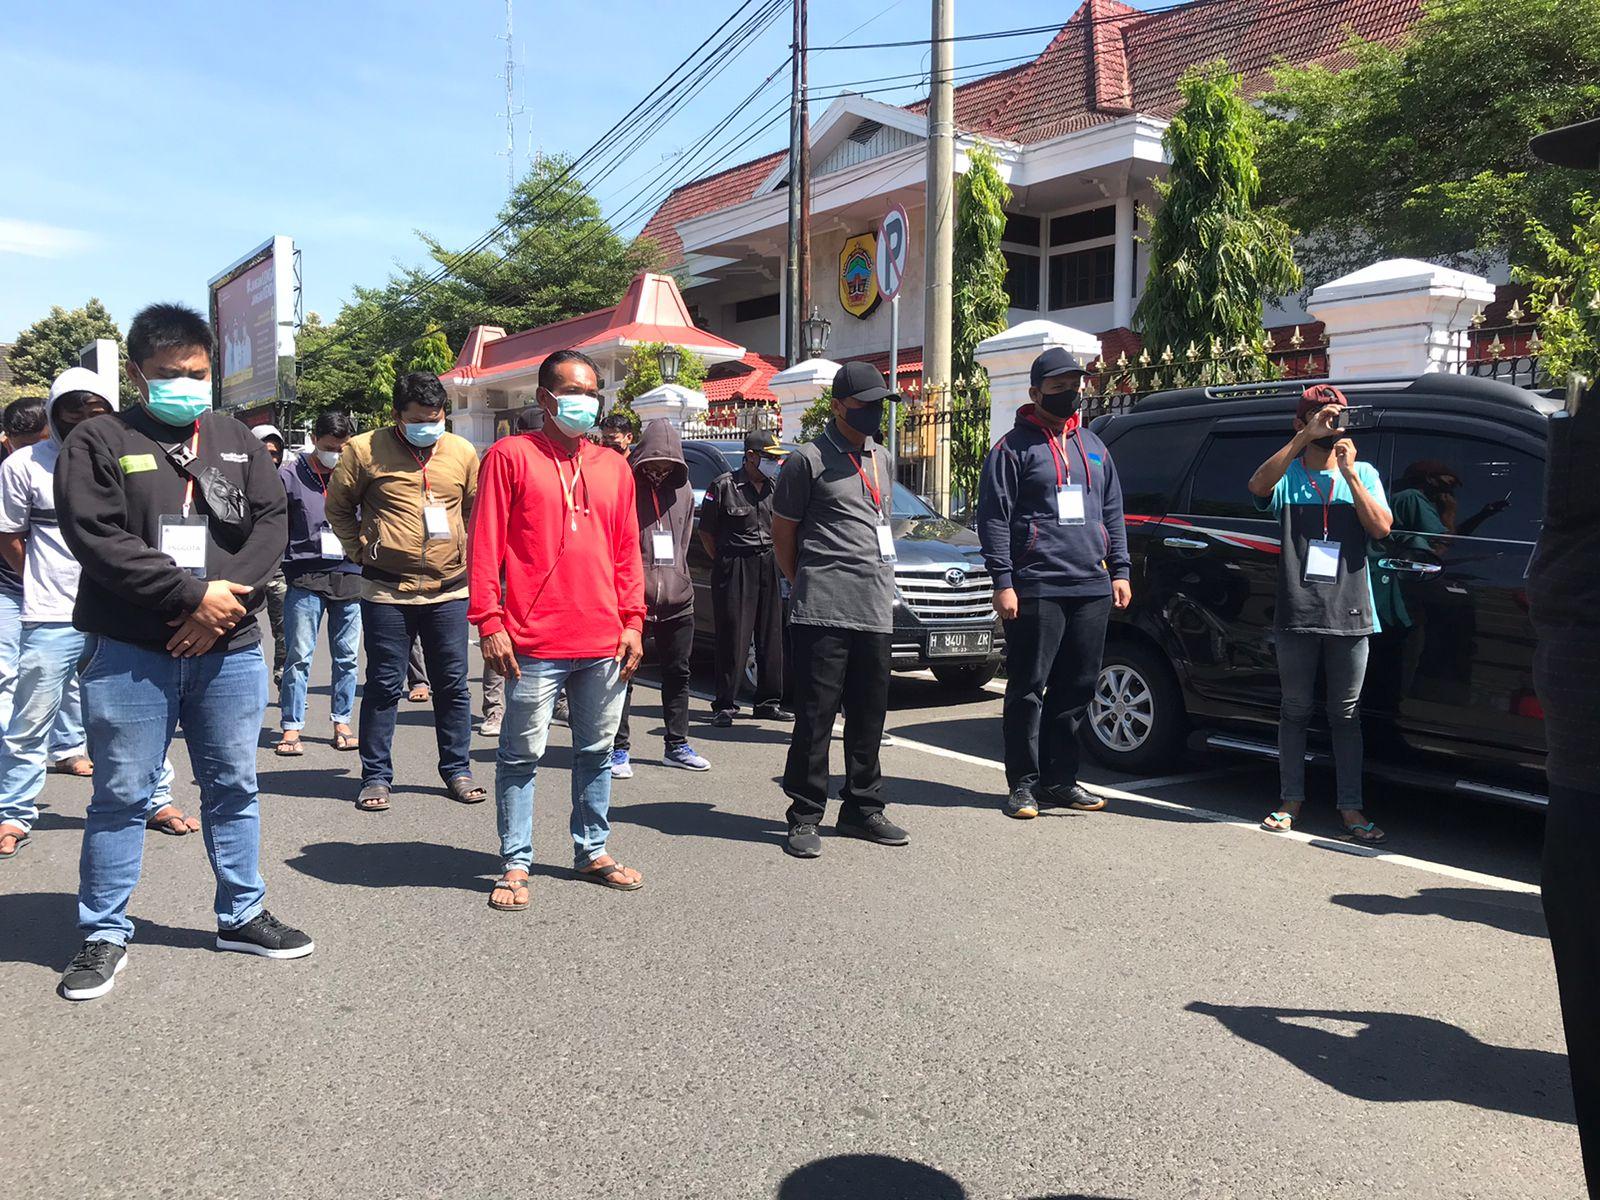 Pimpinan mosi: Yayak pimpin protes di depan DPRD/Lingkar.co